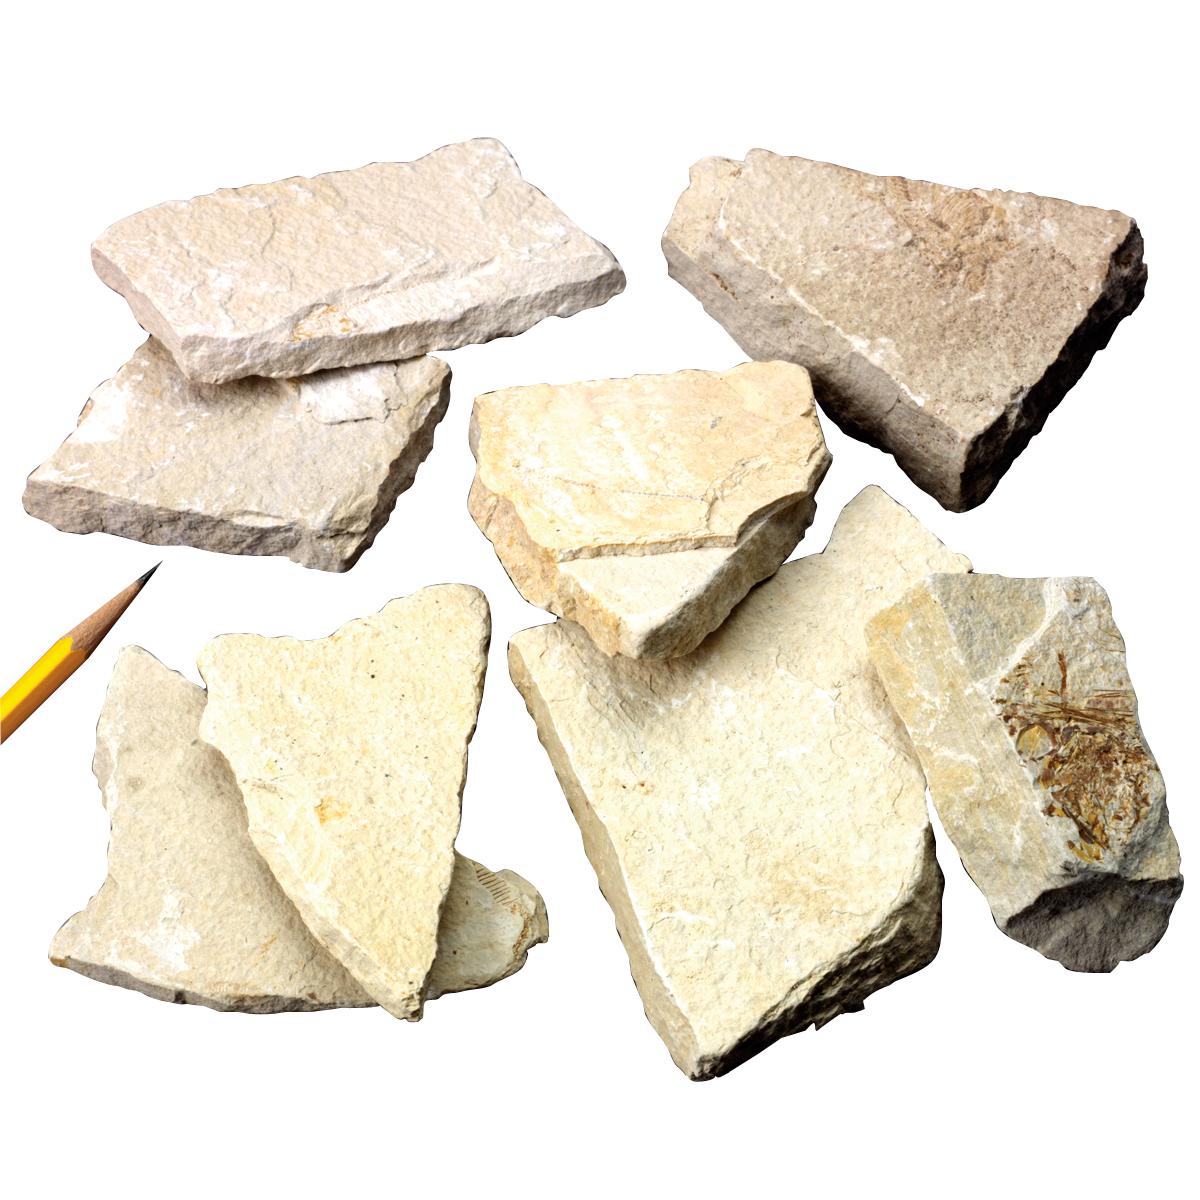 Sedimentary Rocks Siltstone 1 Kg